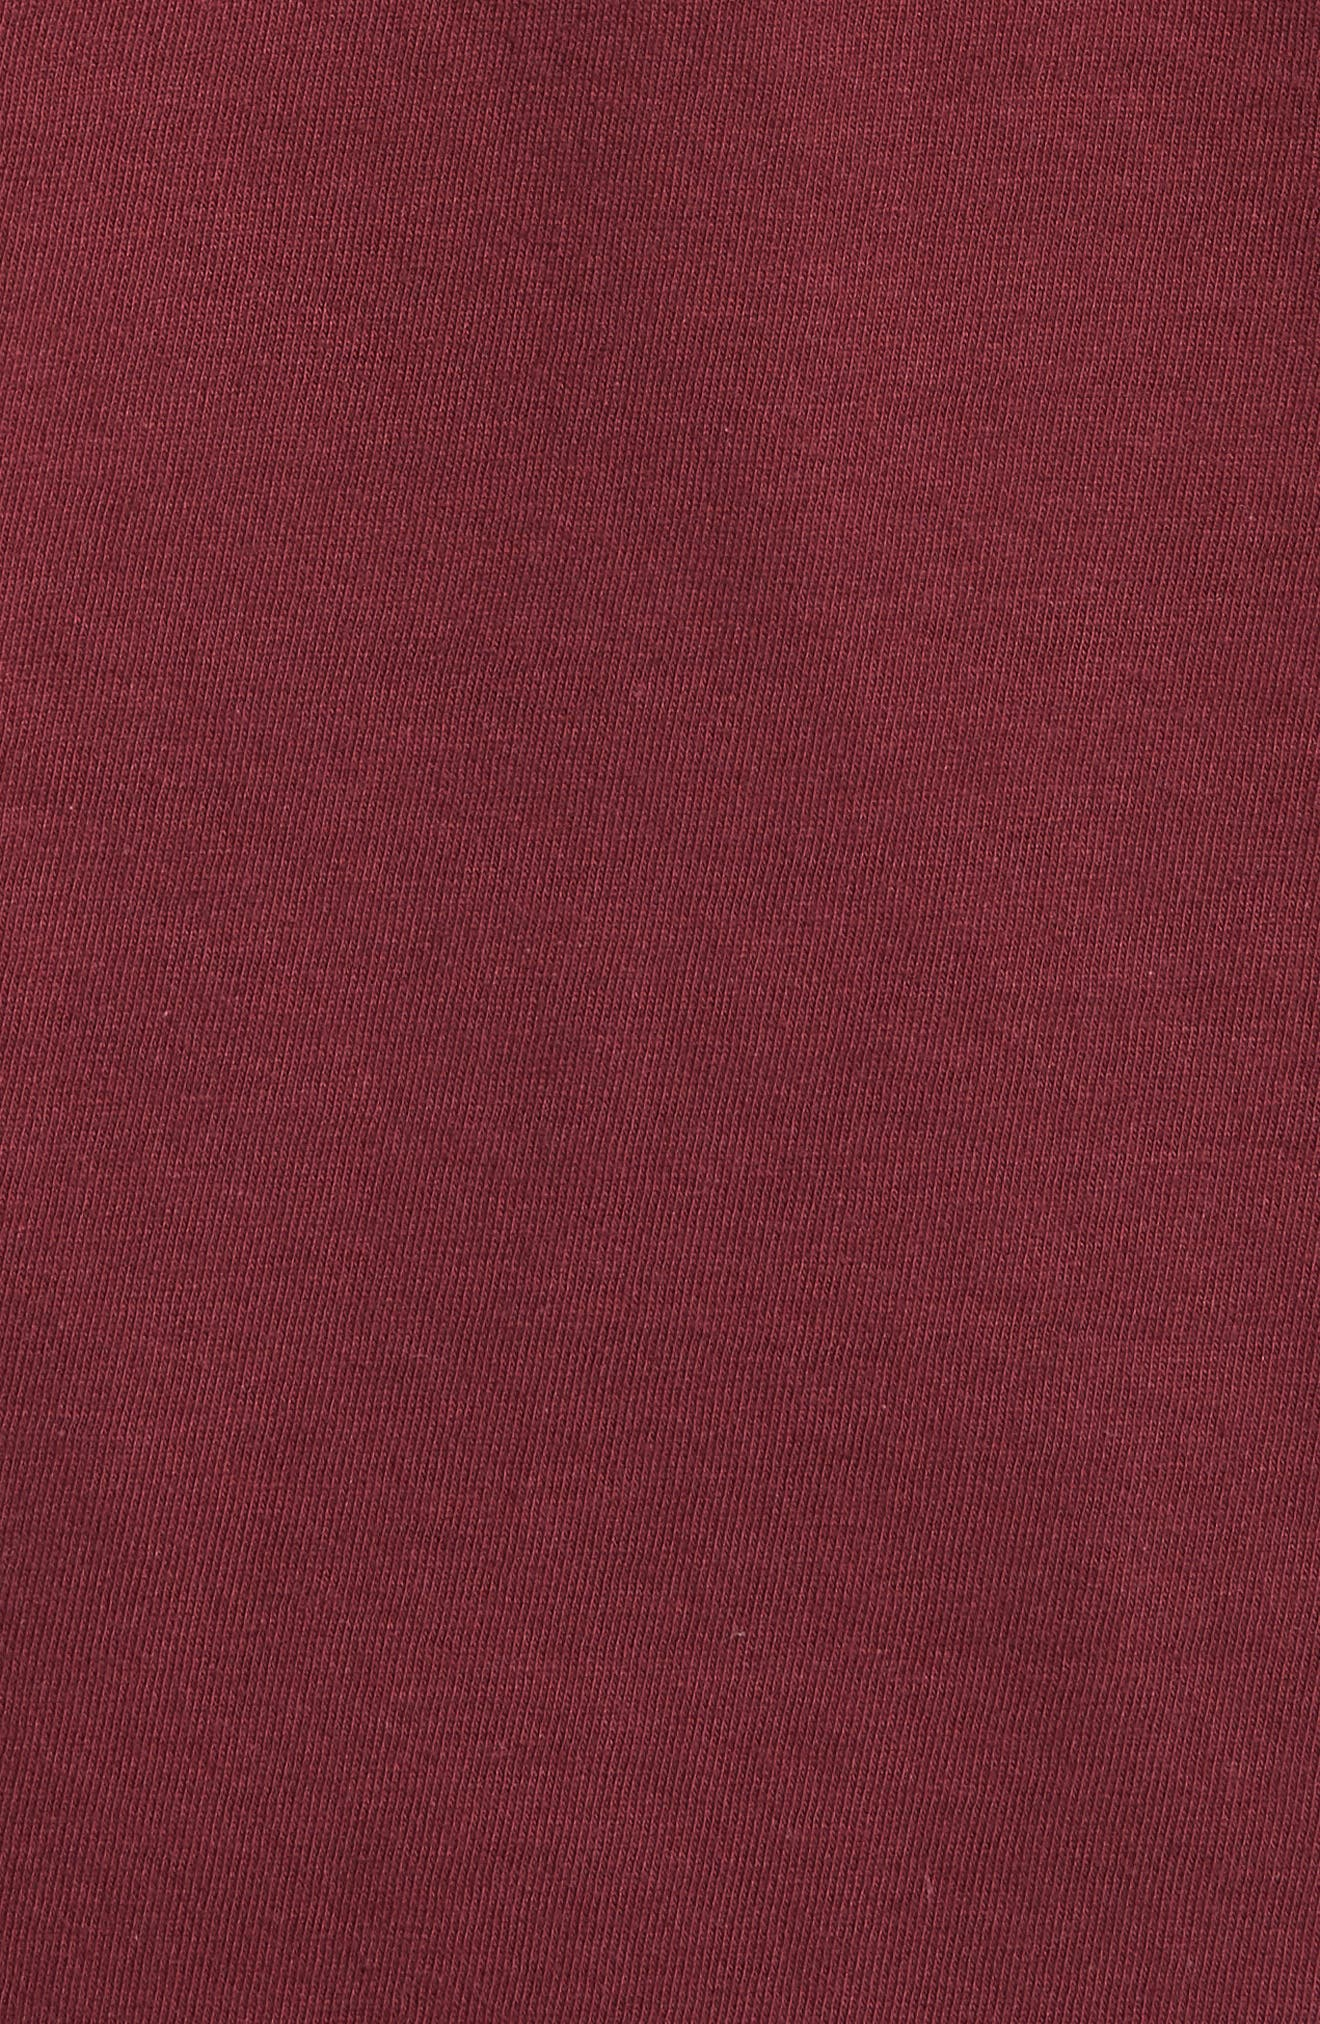 Established '66 Graphic T-Shirt,                             Alternate thumbnail 10, color,